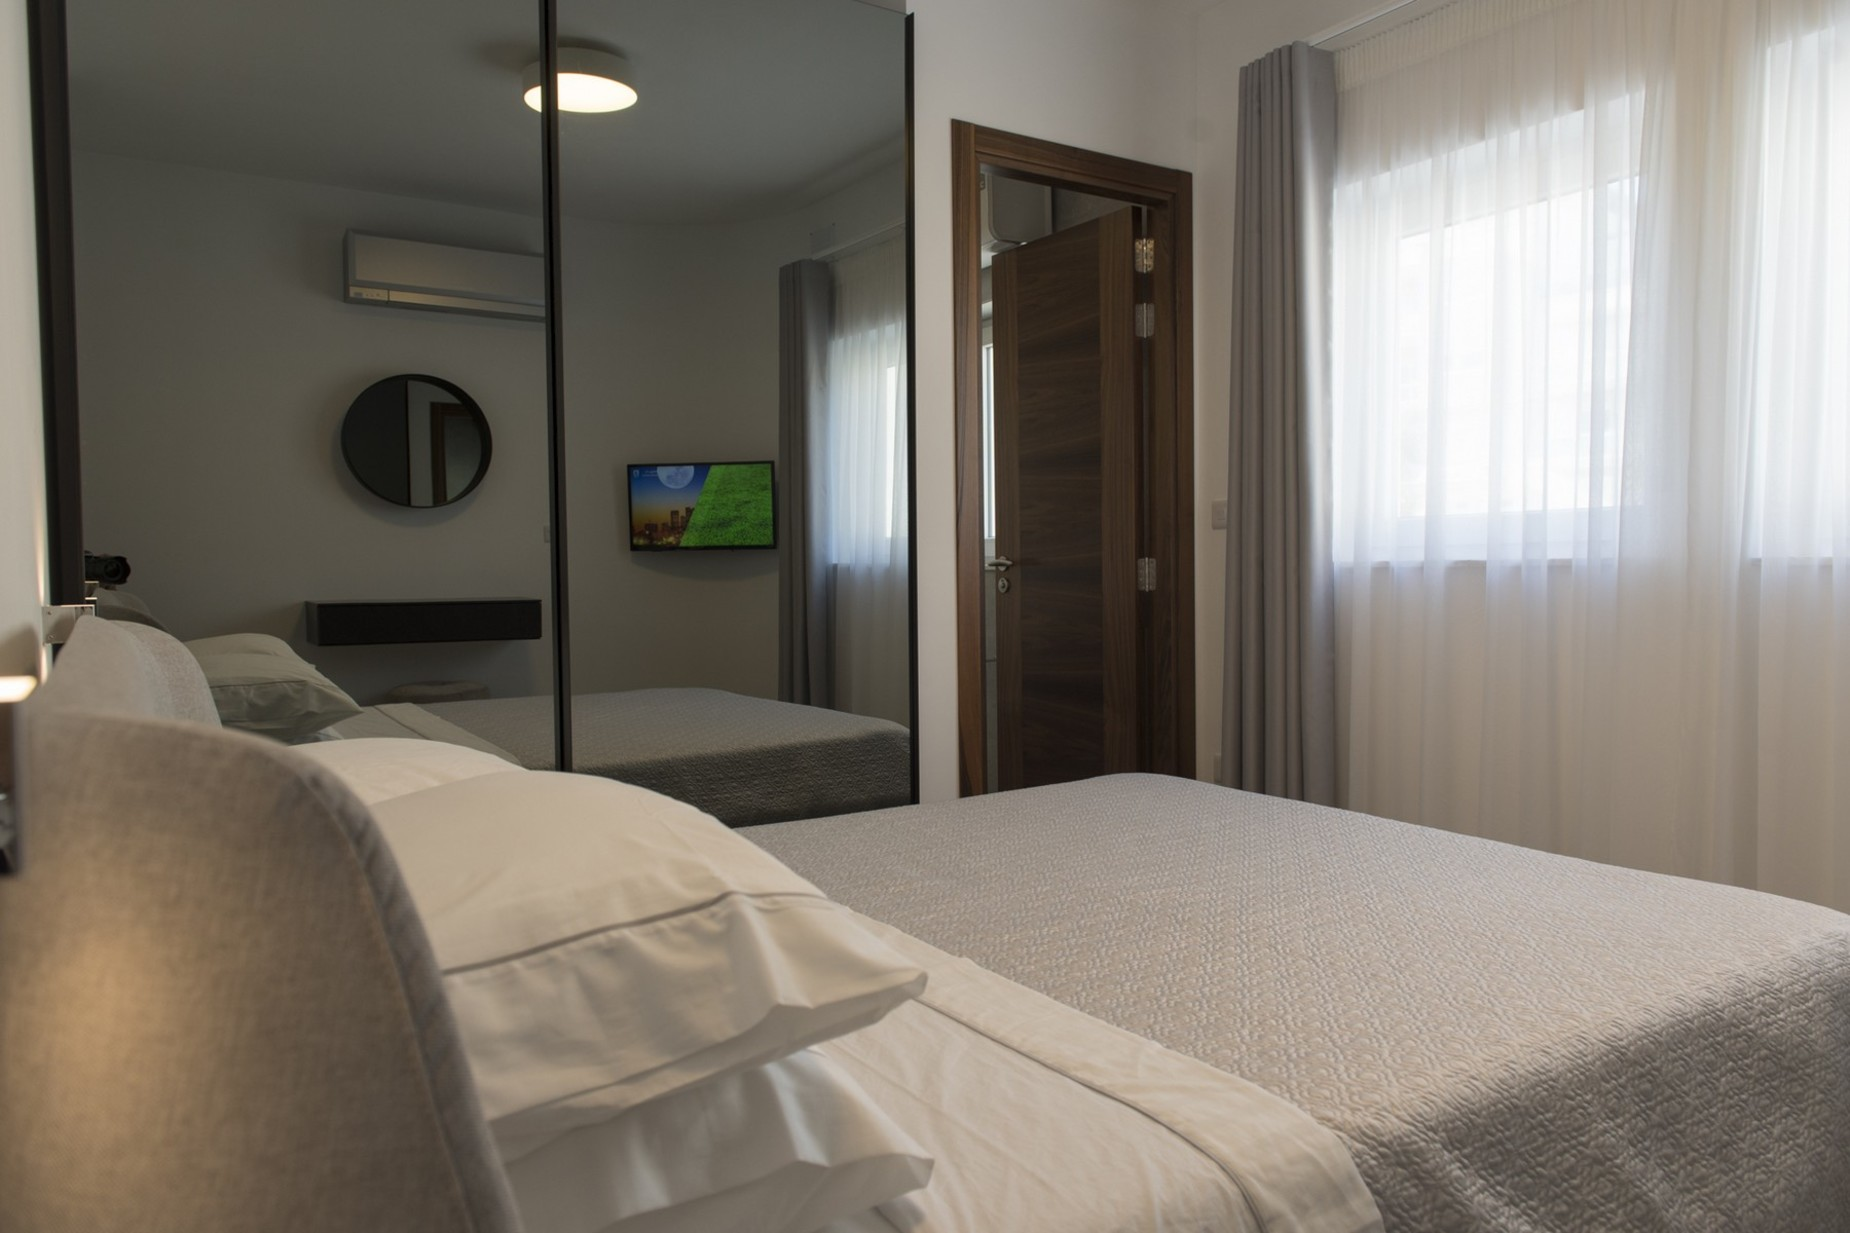 3 bed Villa For Rent in Ibragg, Ibragg - thumb 10